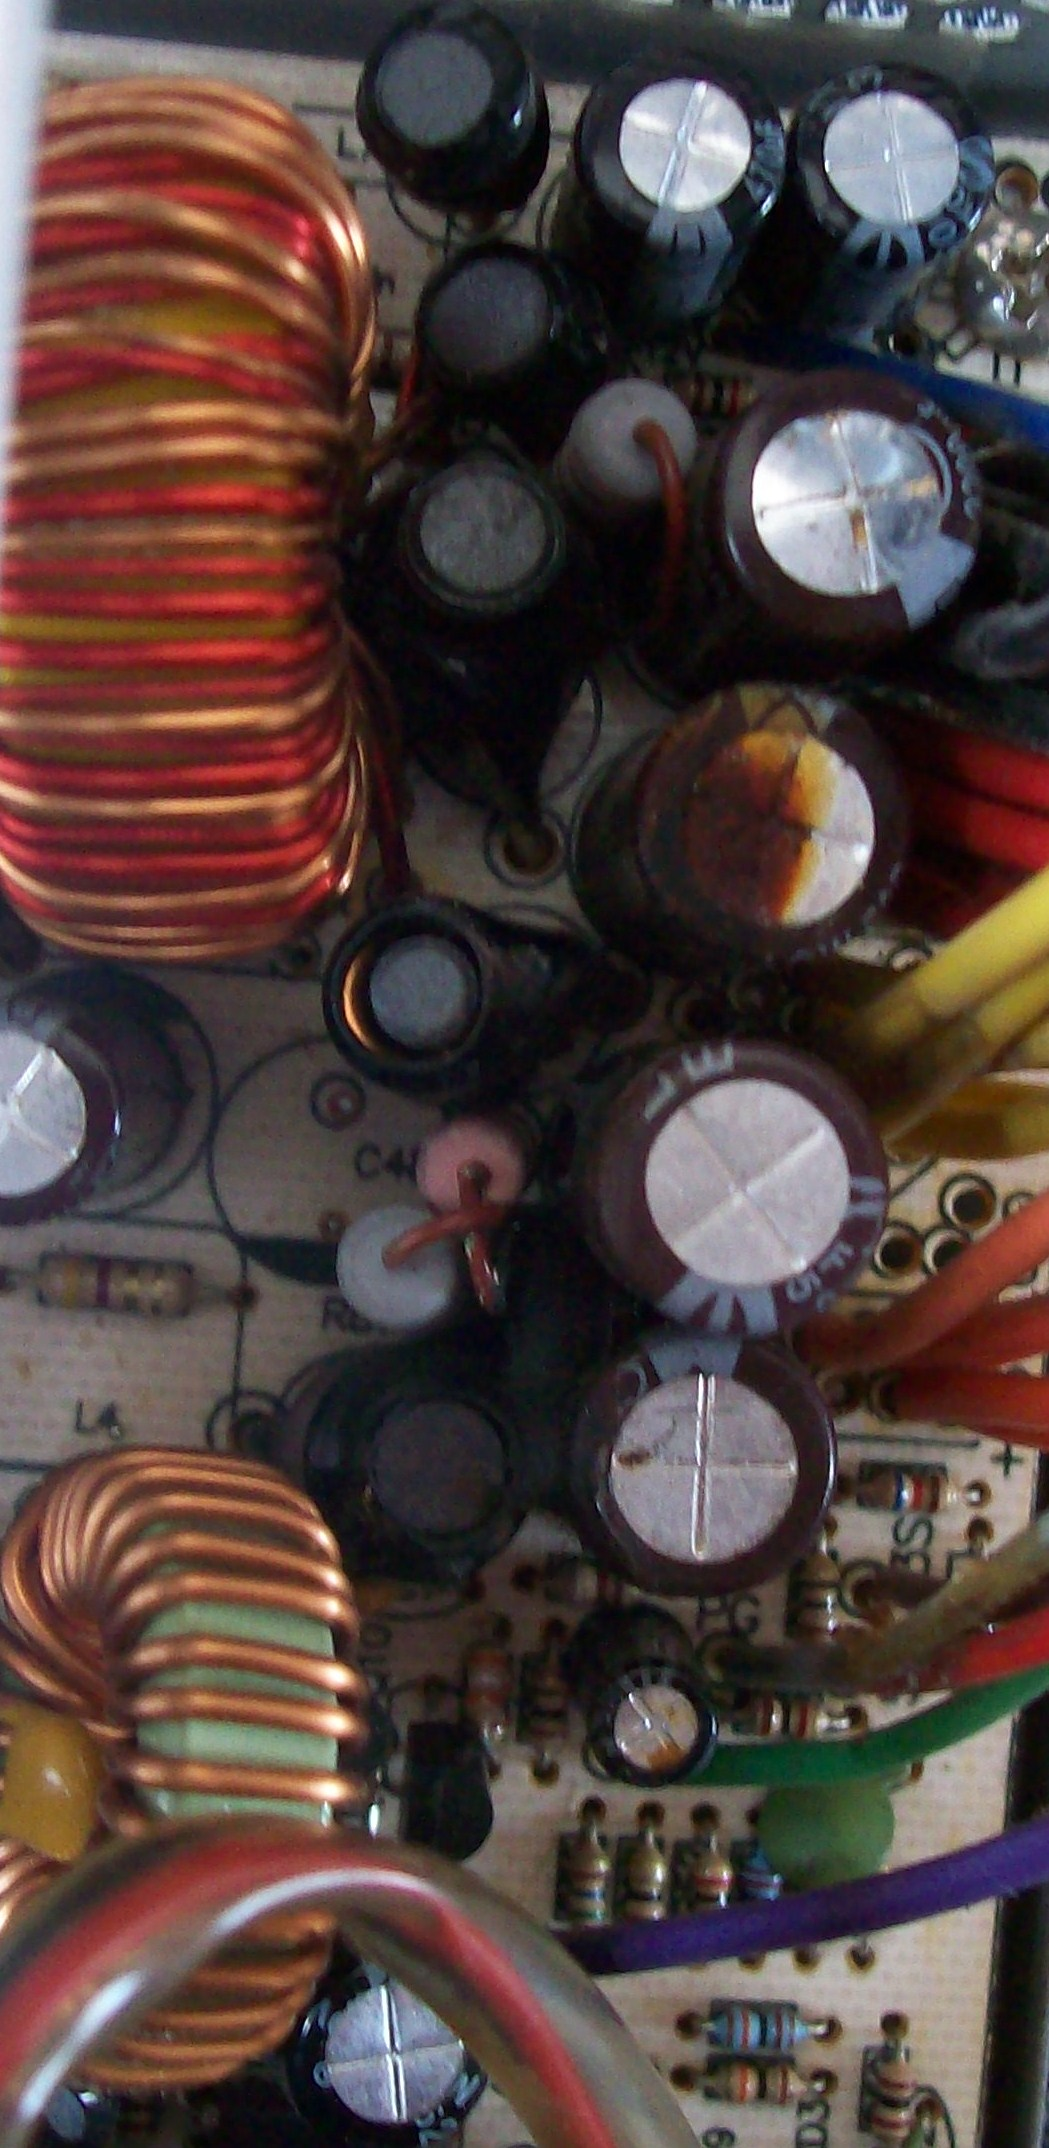 Ocena jako�ci kondensator�w na zasilaczu tracer 4life 400w